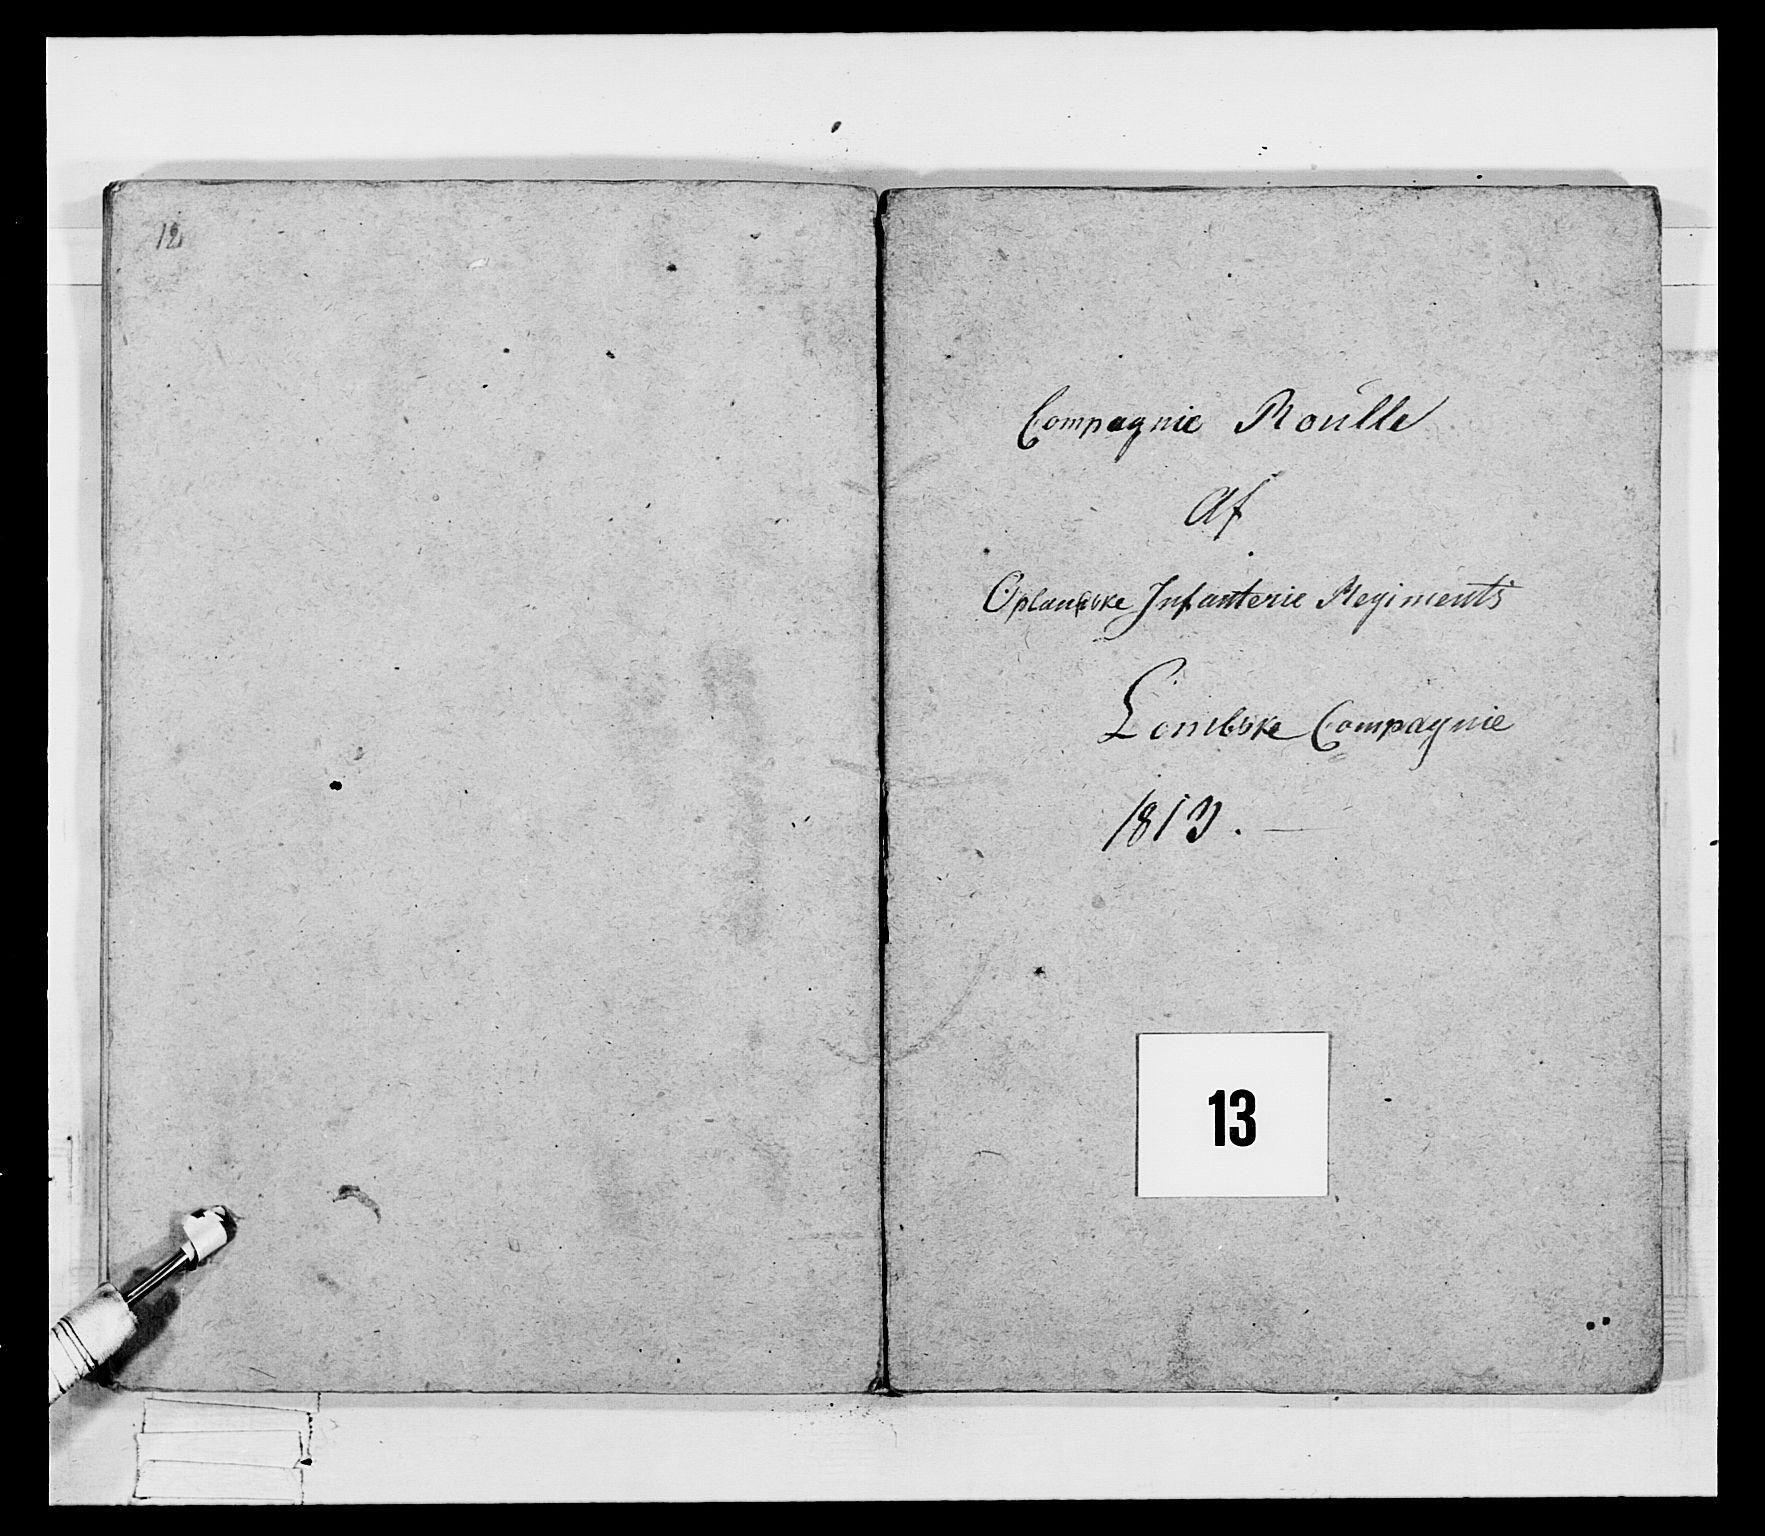 RA, Generalitets- og kommissariatskollegiet, Det kongelige norske kommissariatskollegium, E/Eh/L0069: Opplandske gevorbne infanteriregiment, 1810-1818, p. 616